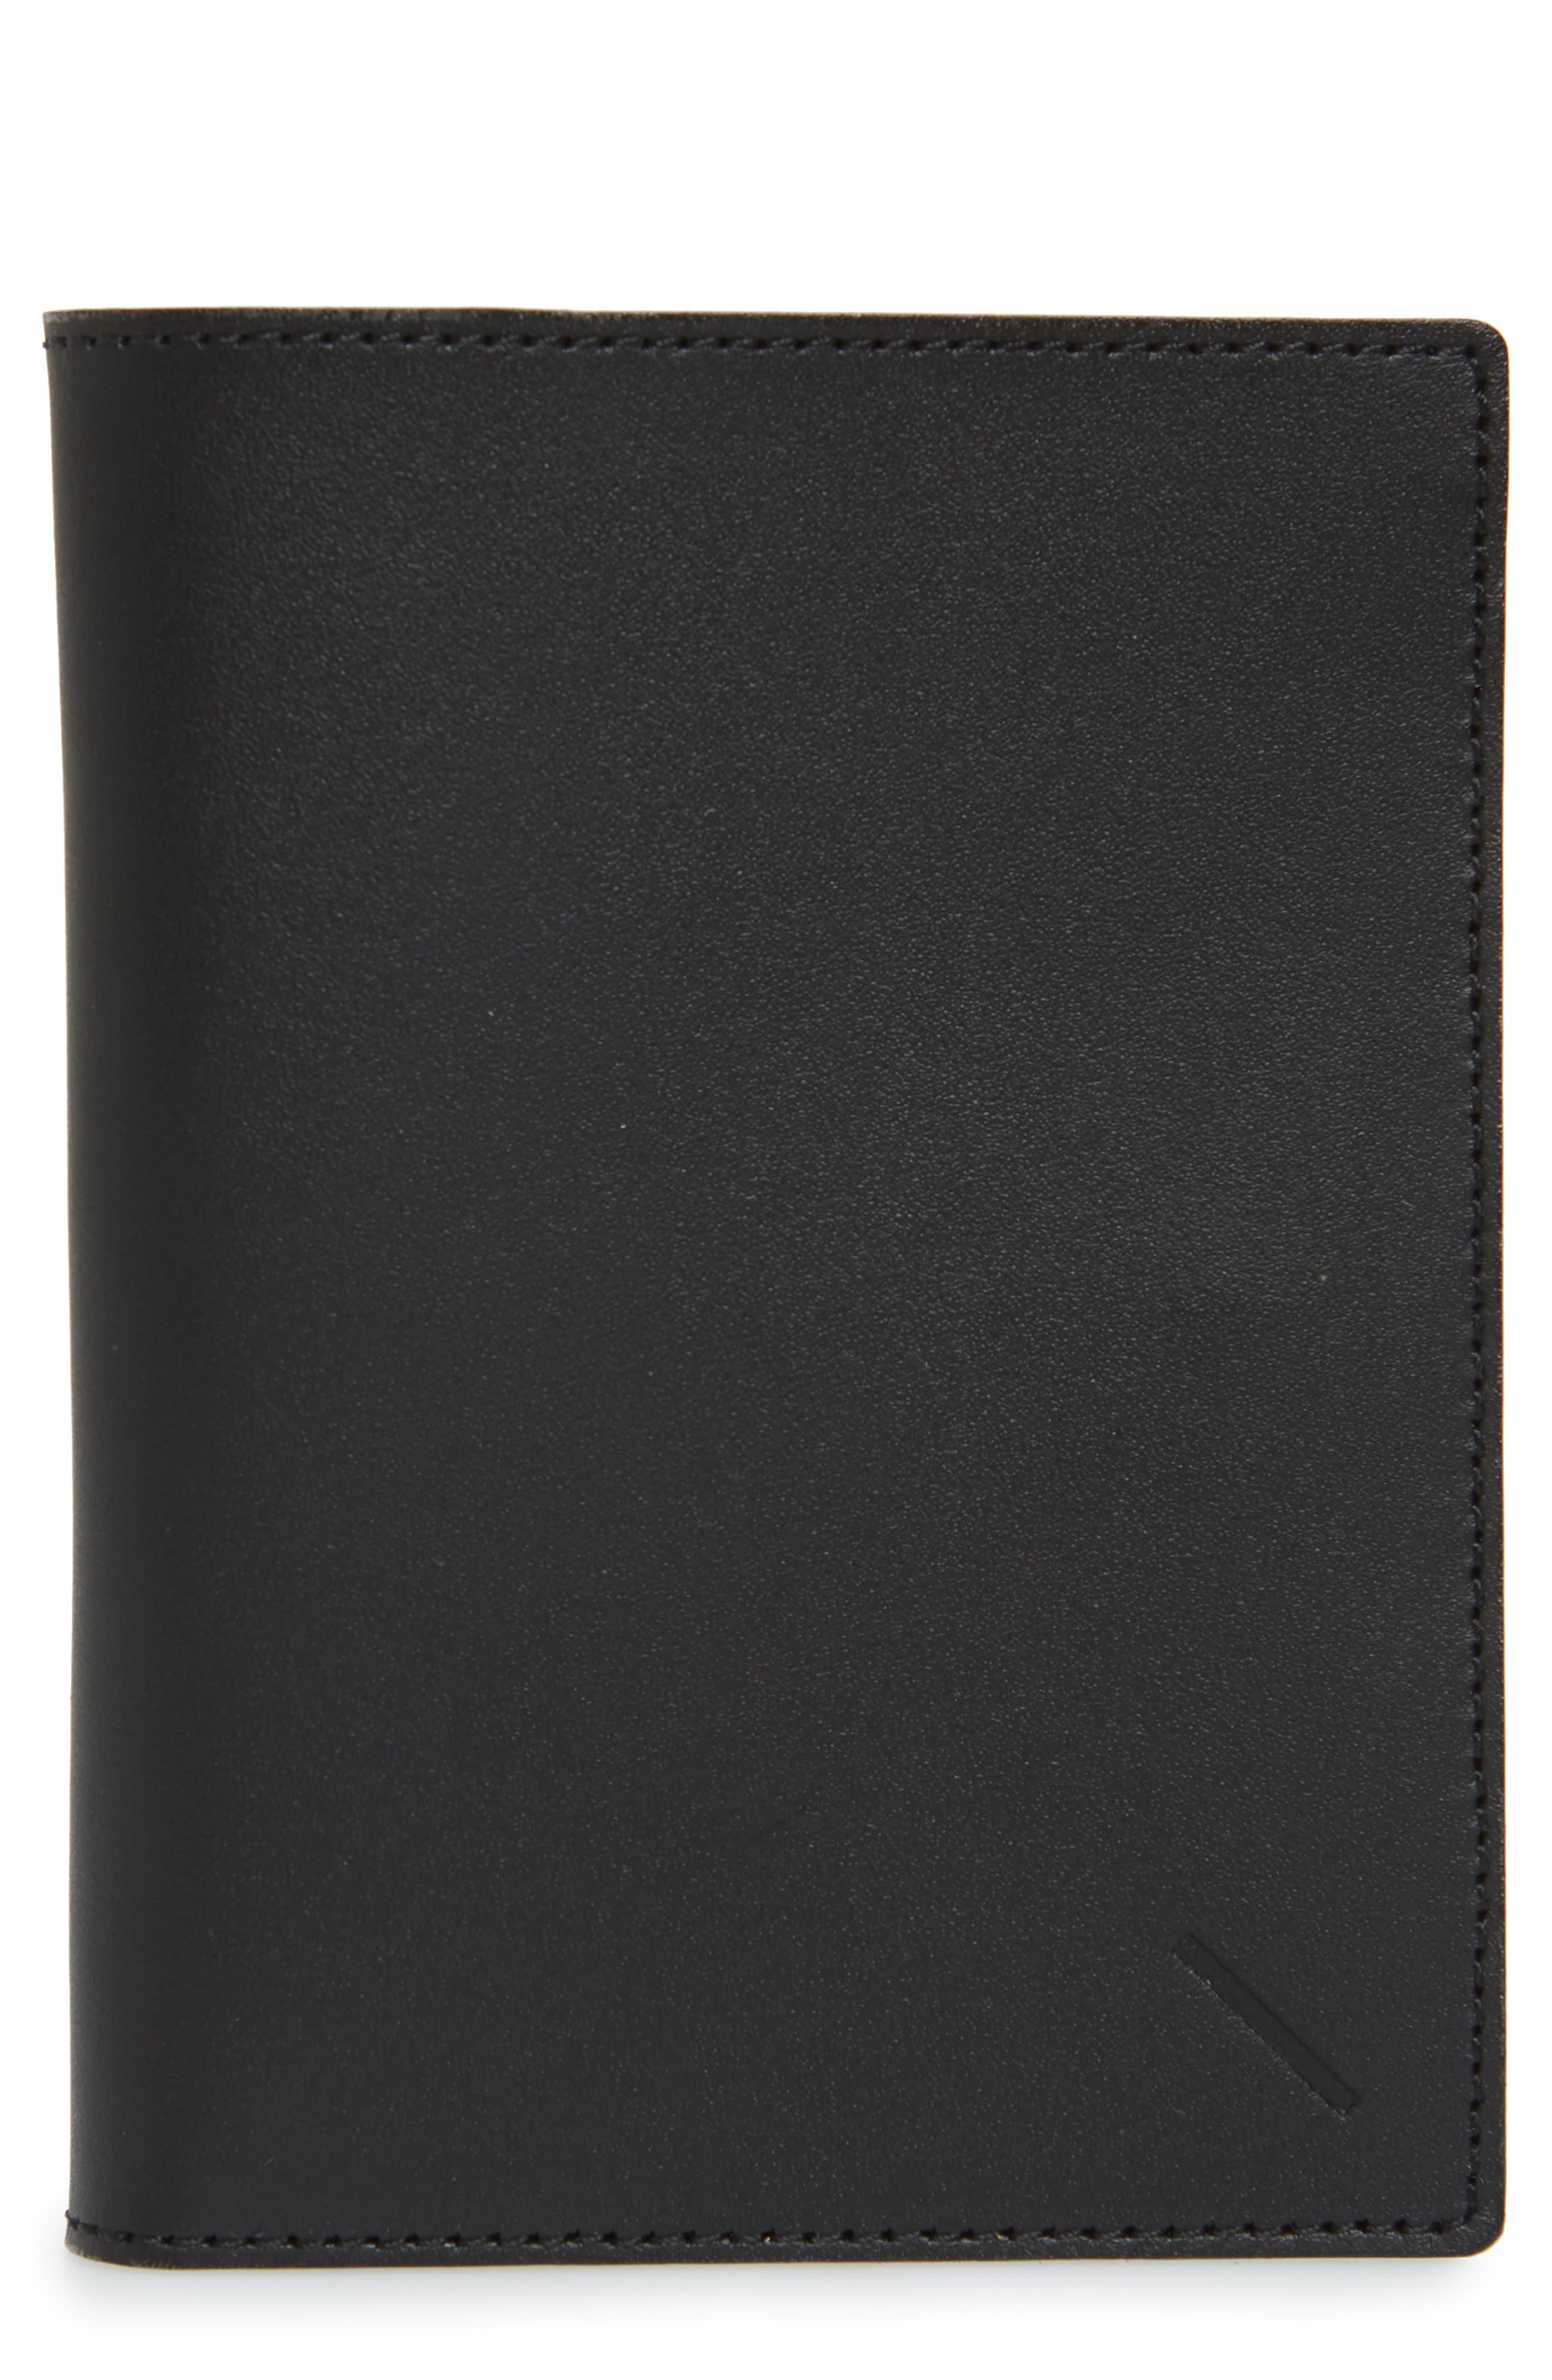 SATURDAYS NYC Leather Passport Wallet, Main, color, BLACK